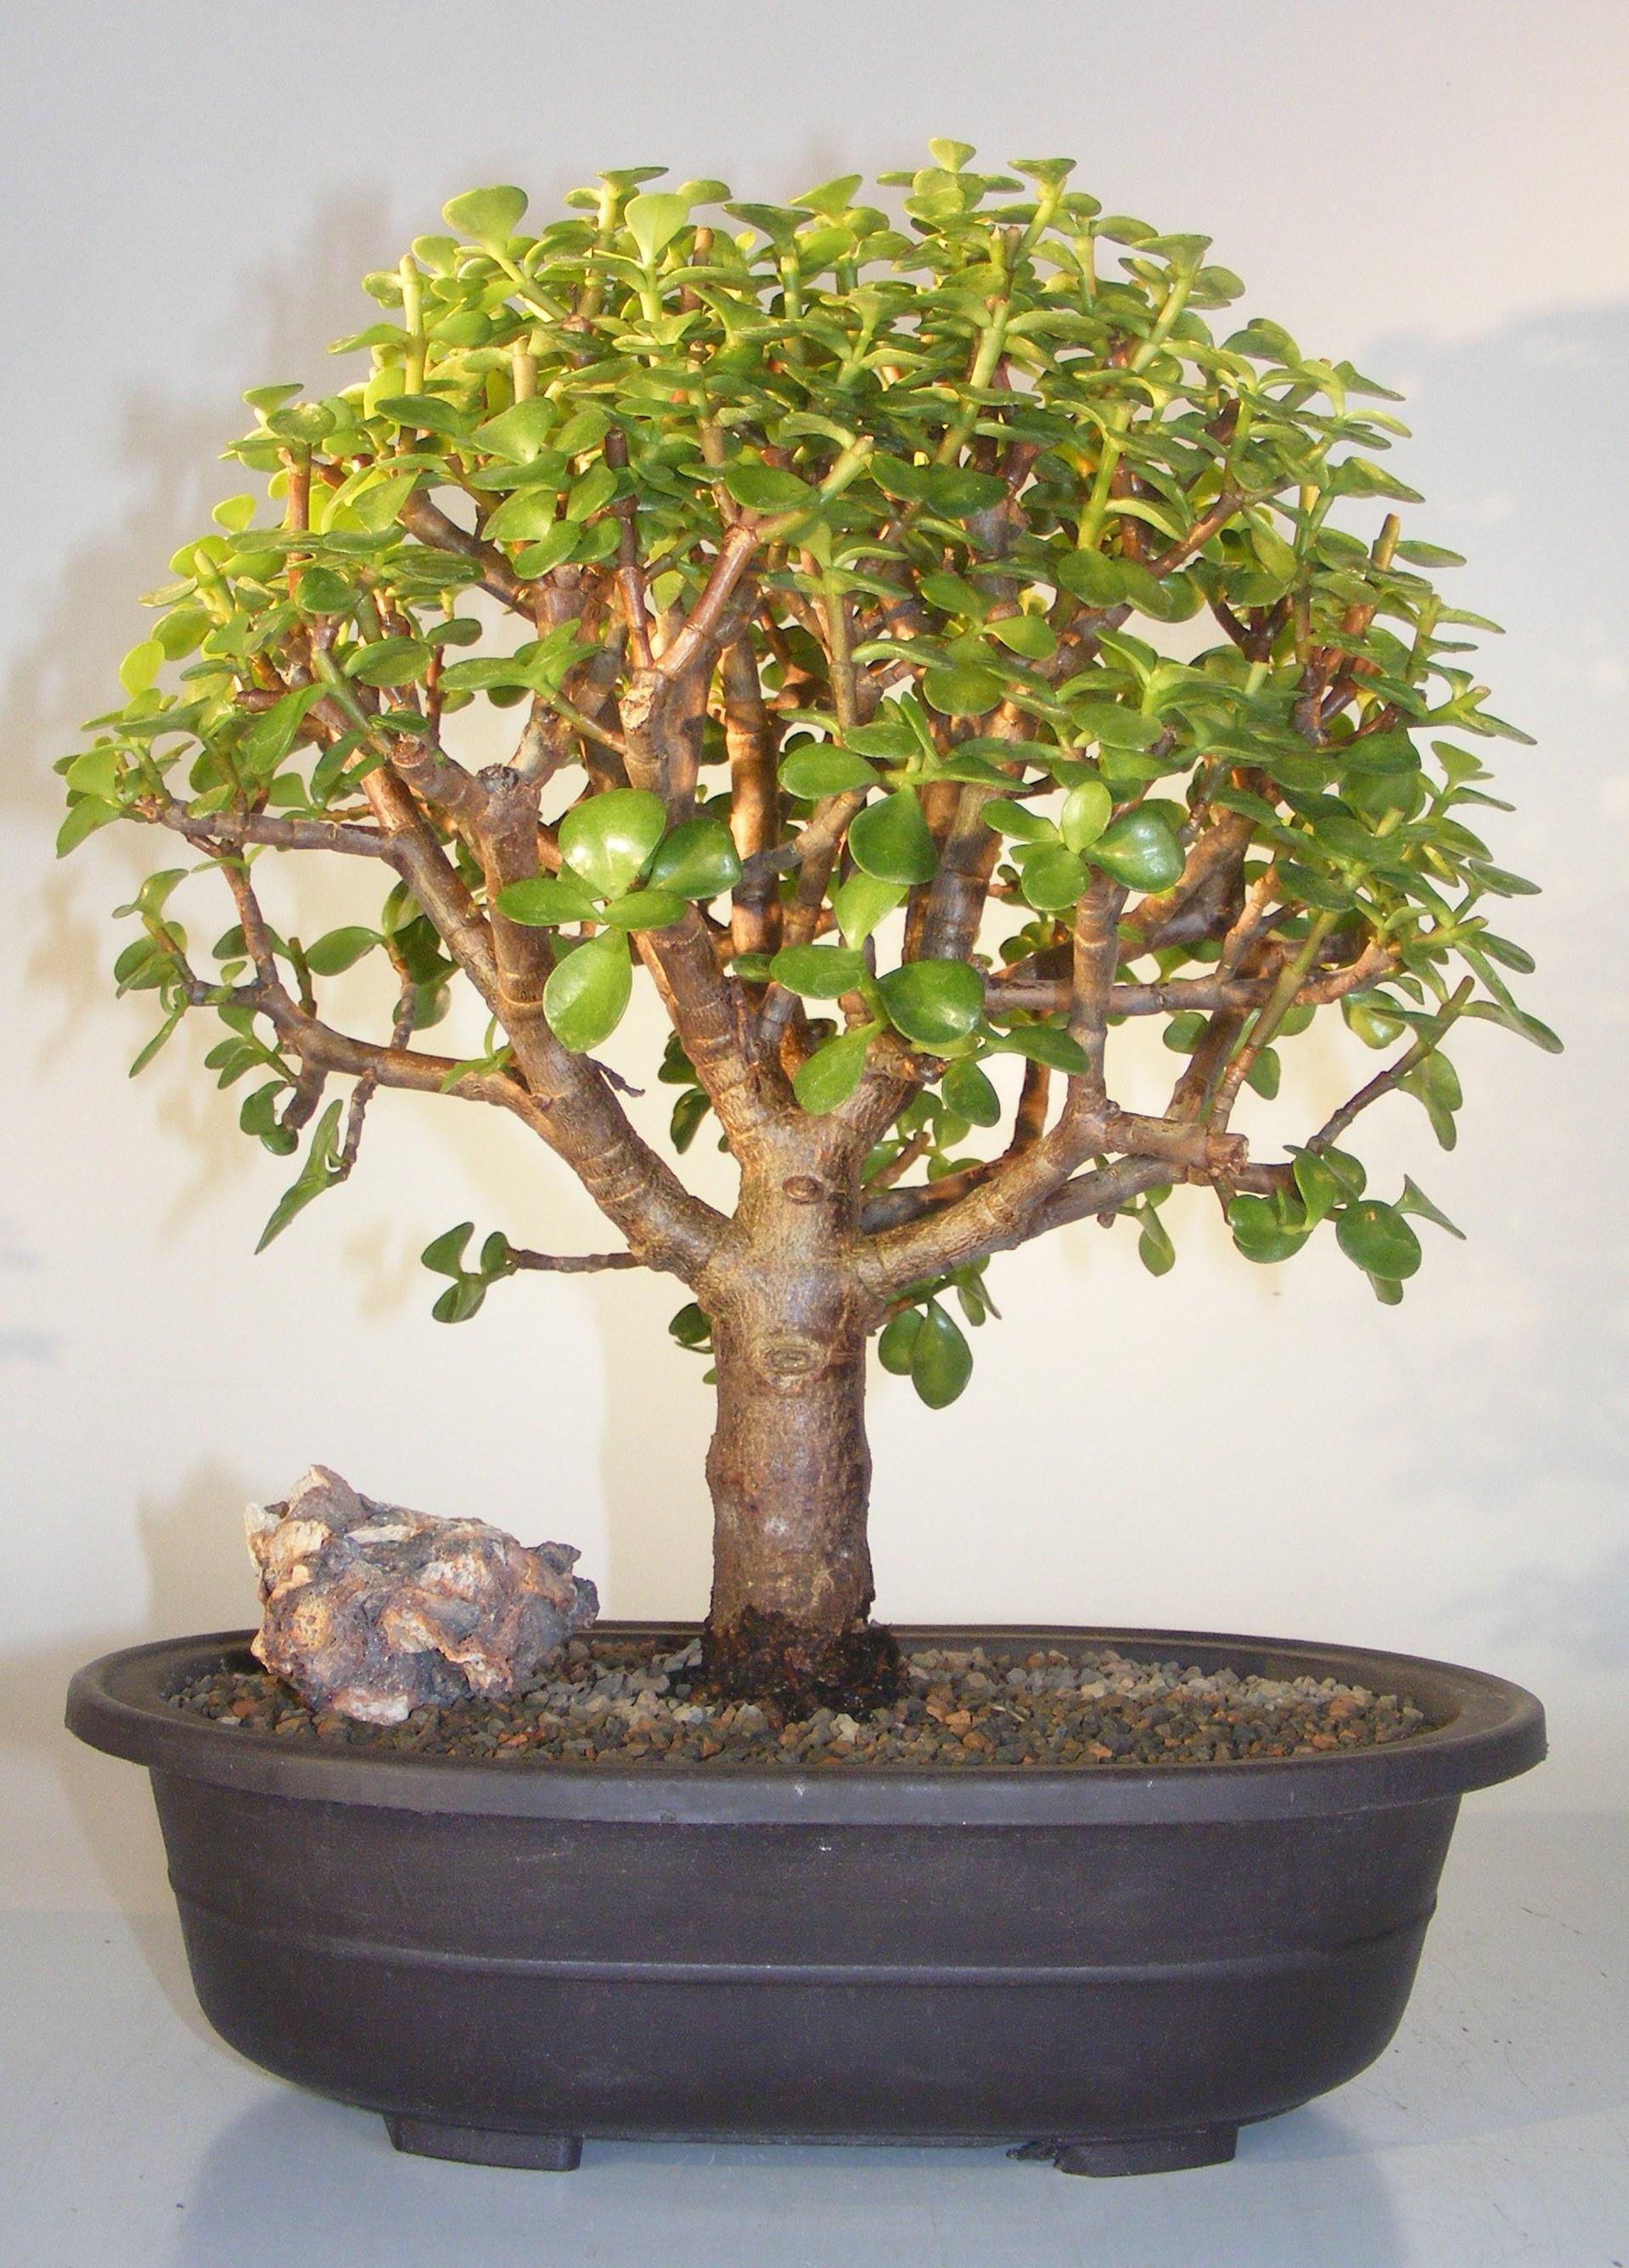 Baby Jade Bonsai Tree(Portulacaria Afra) Image